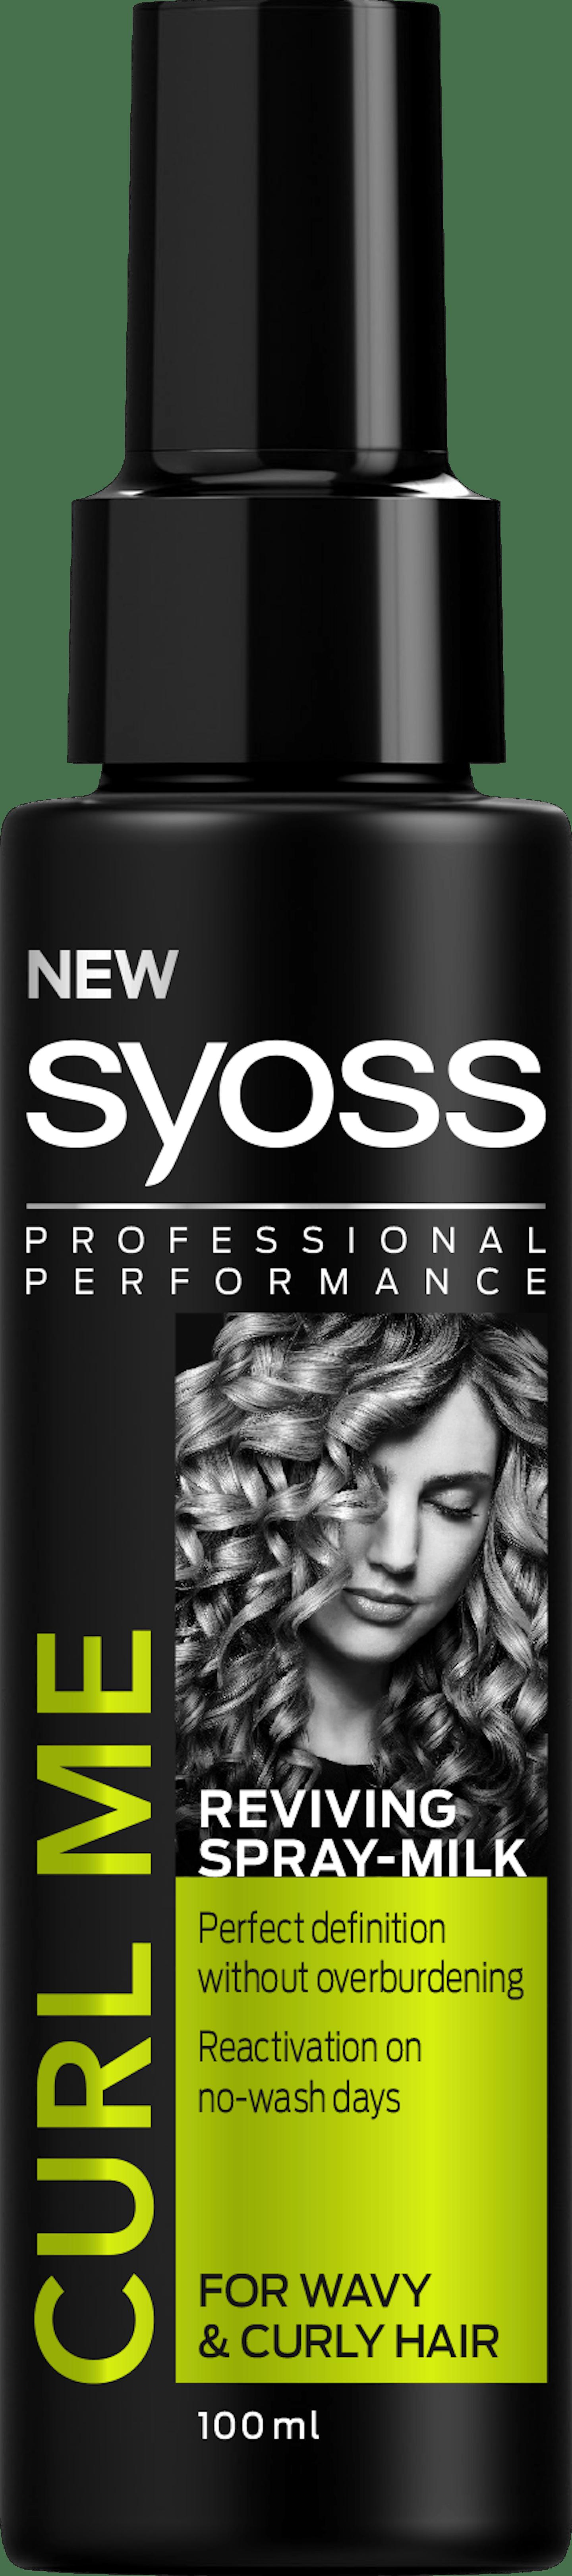 Syoss Curl Me Reviving Spray Milk